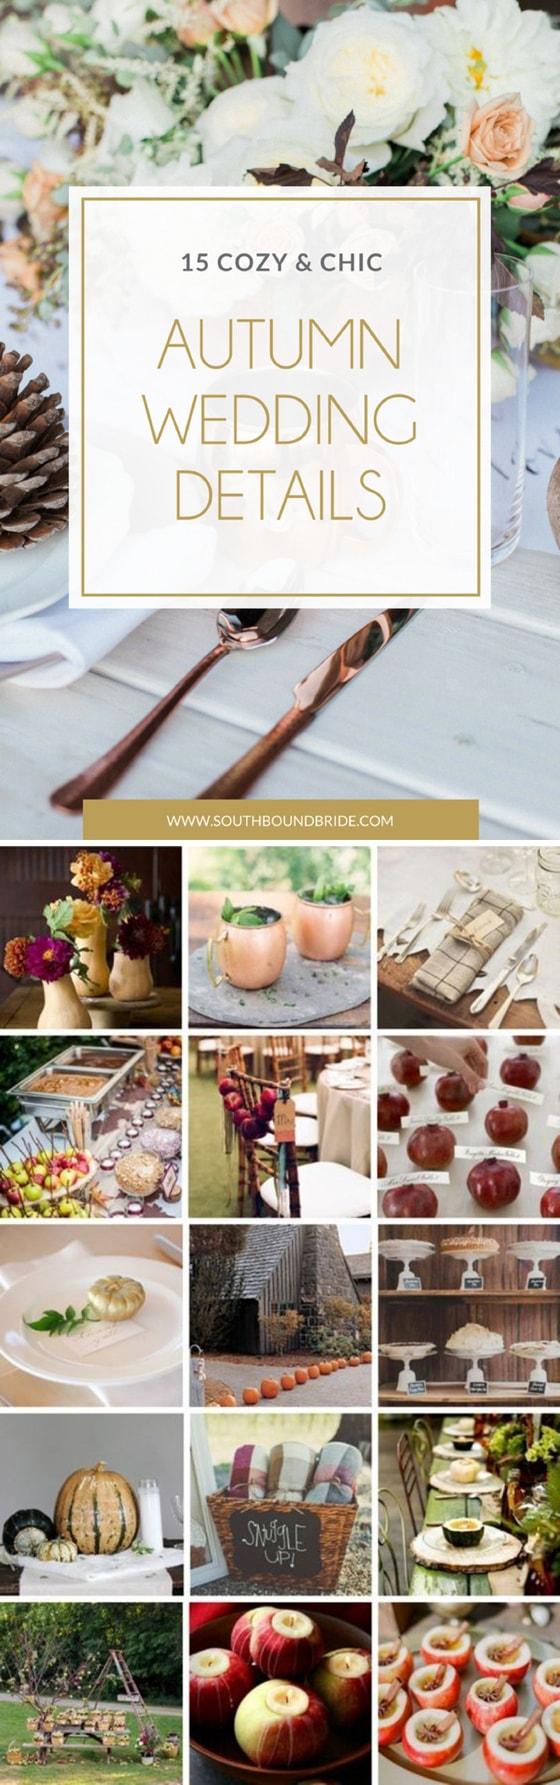 15 Cosy & Chic Autumn Wedding Details & Ideas   SouthBound Bride